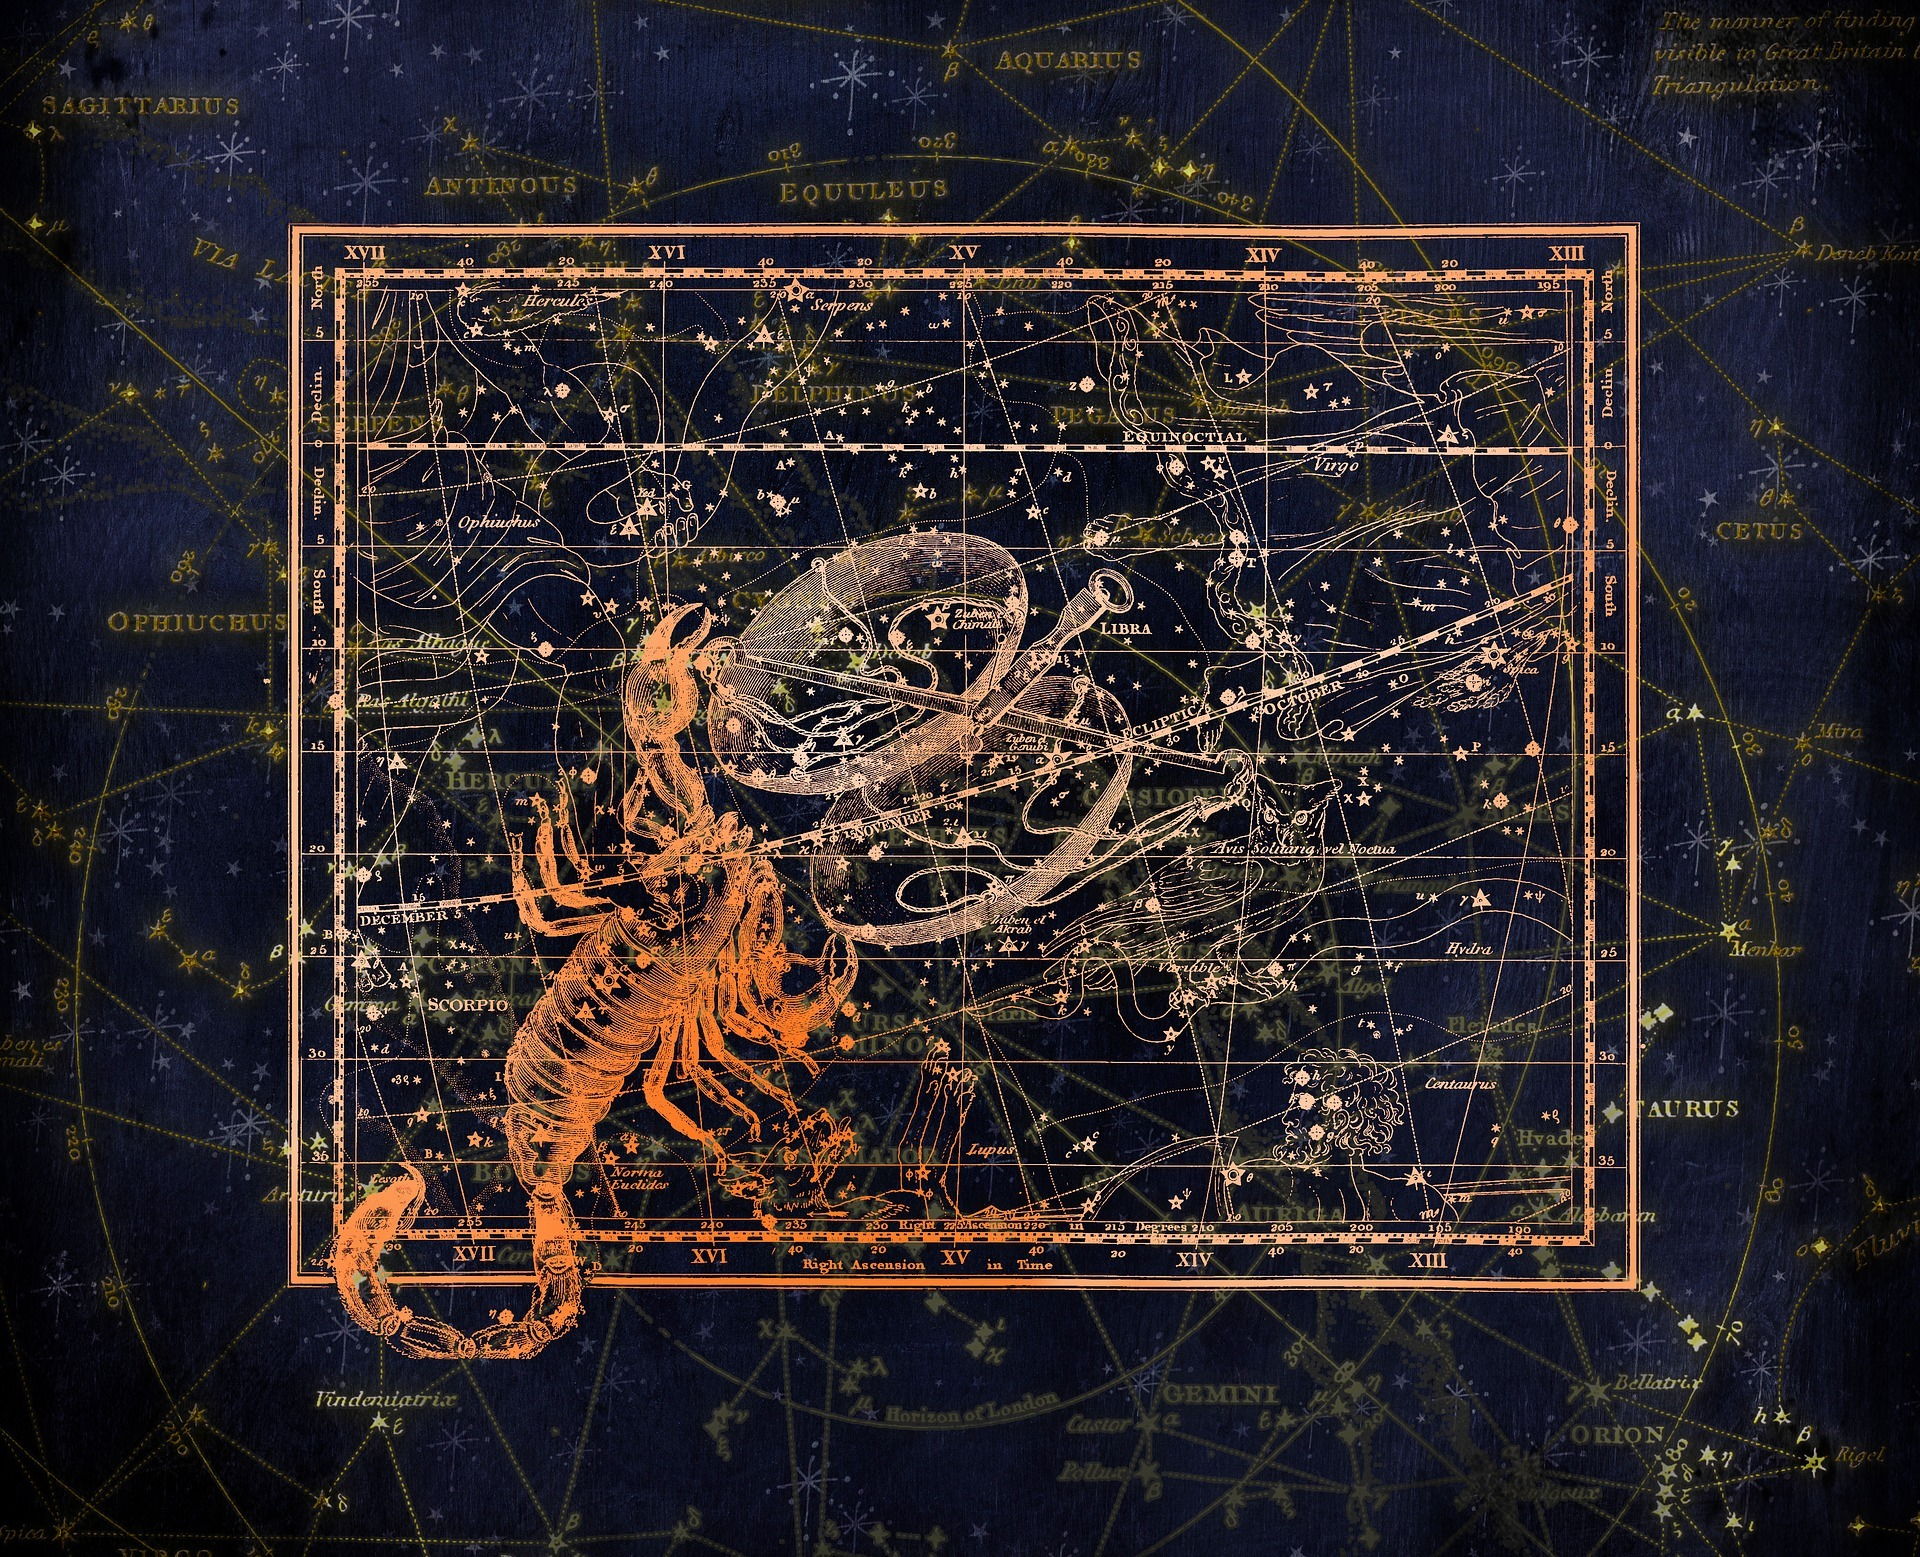 constellation-3301760_1920.jpg